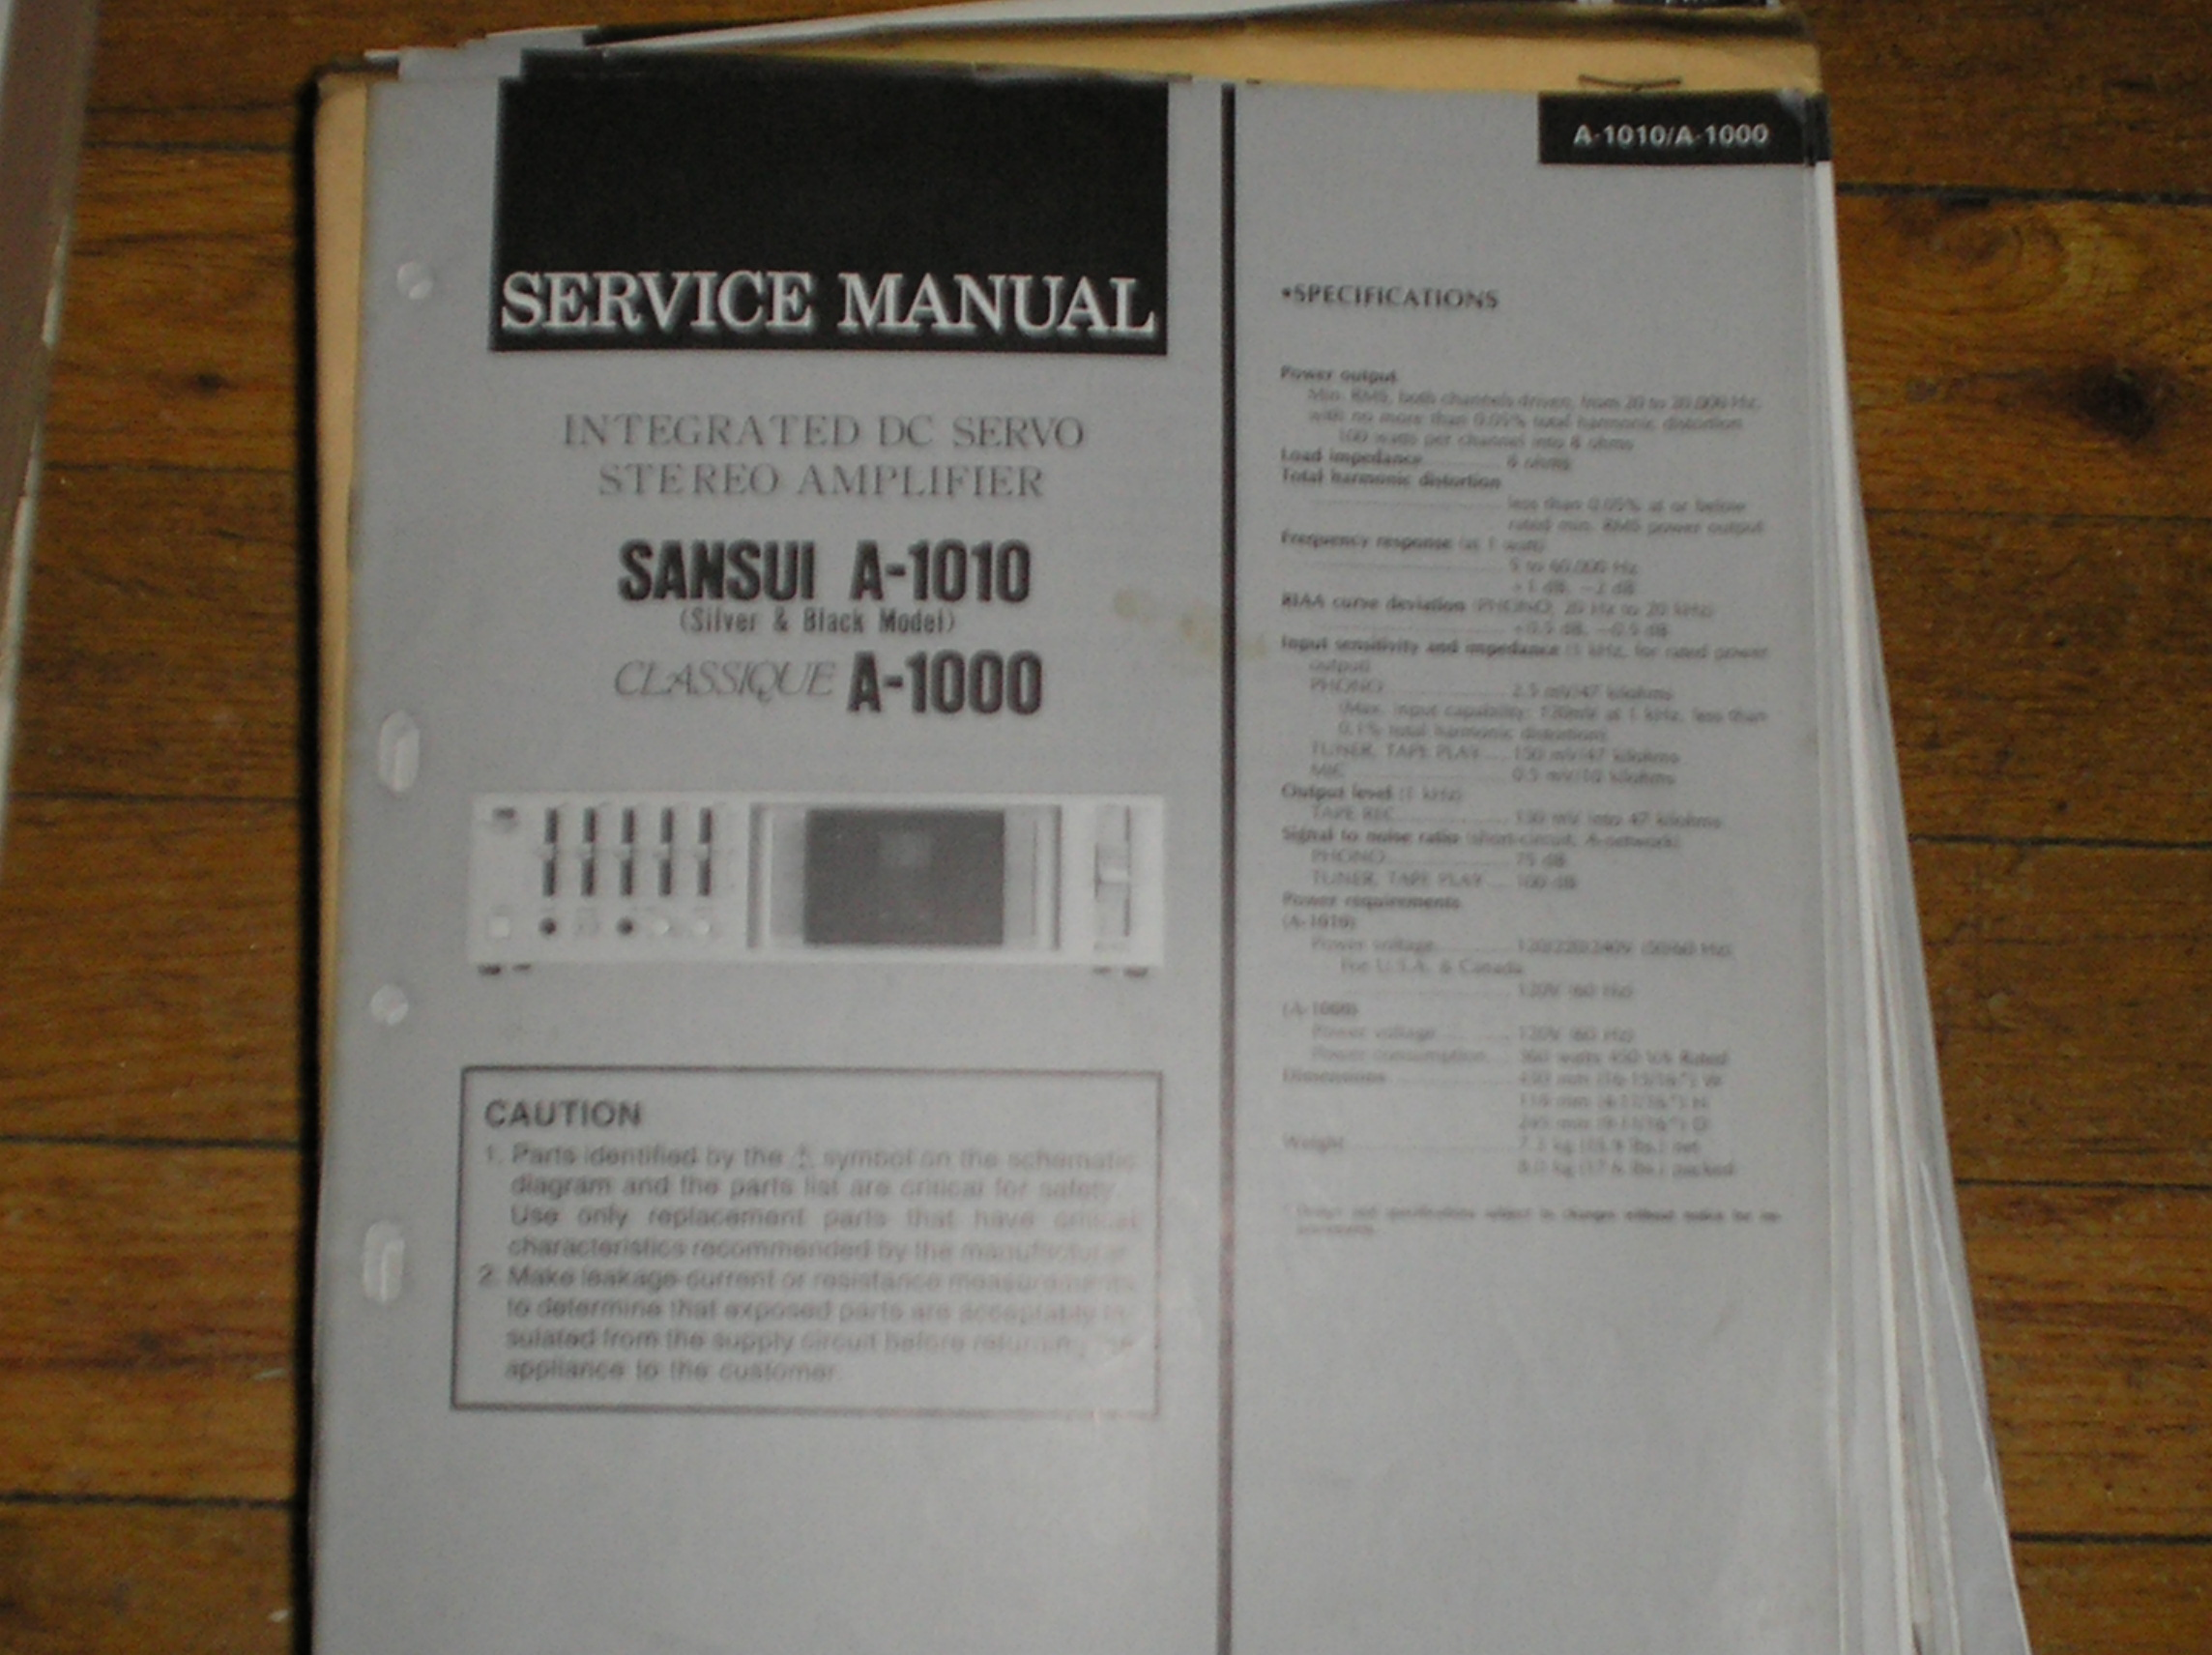 A-1010 A-1000 Classique Amplifier Service Manual